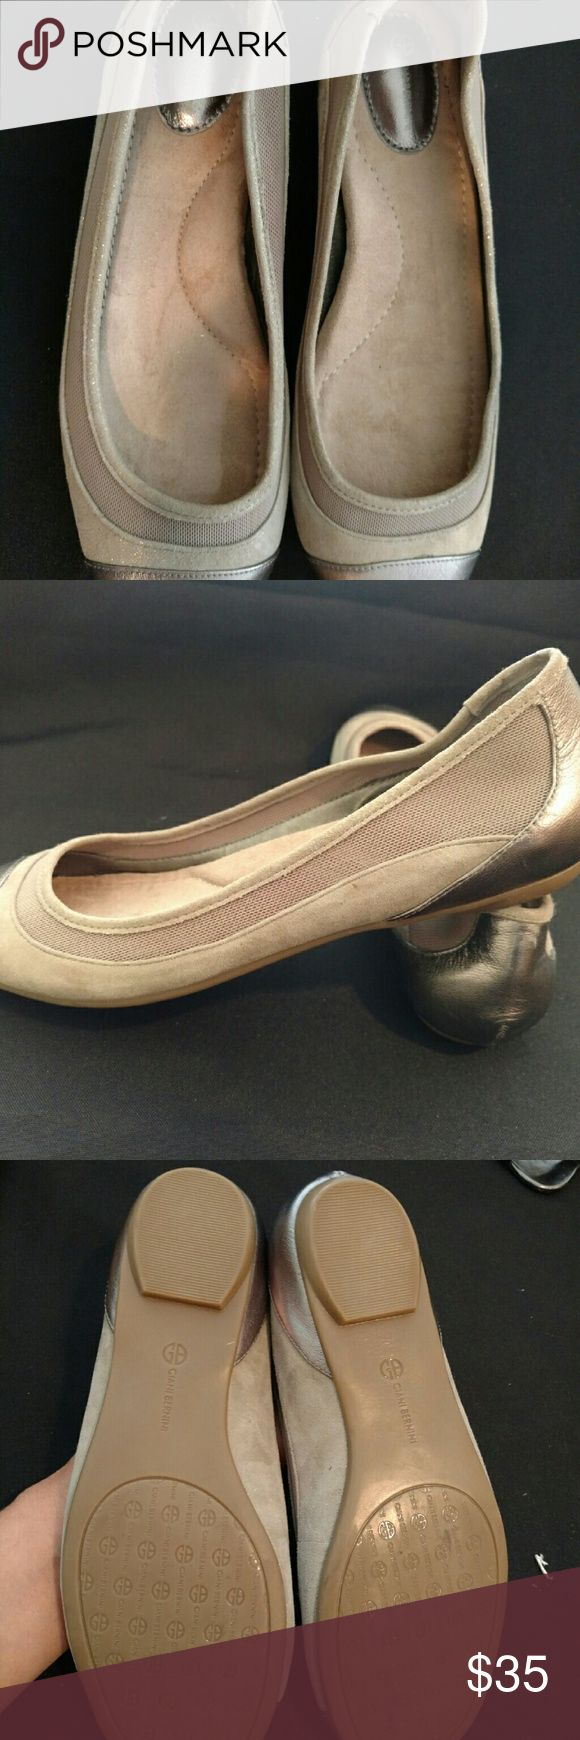 Final sale!!!!!Giani Bernini kat flat 1/4 platform 1'heel memory foam flats round closed toe .new no box , cleaning my closet Giani Bernini Shoes Flats & Loafers